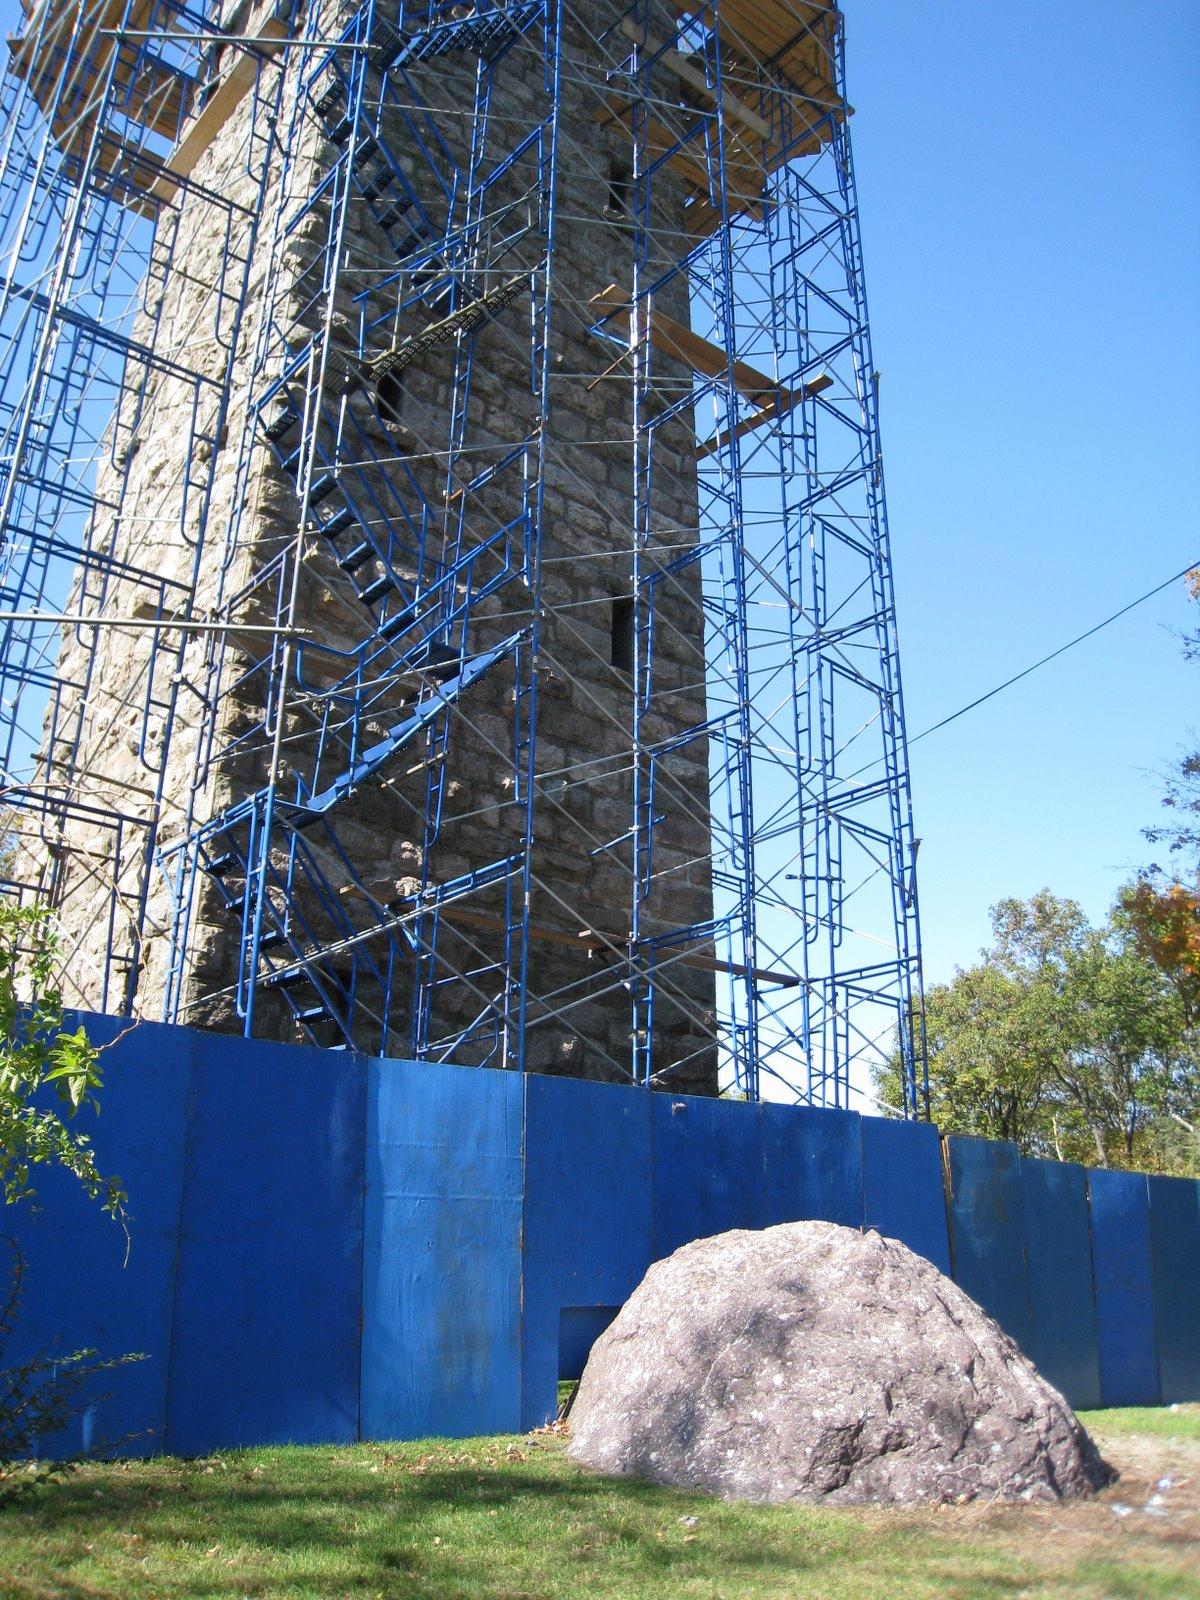 The Smoke Rise And Kinnelon Blog The Smoke Rise Tower